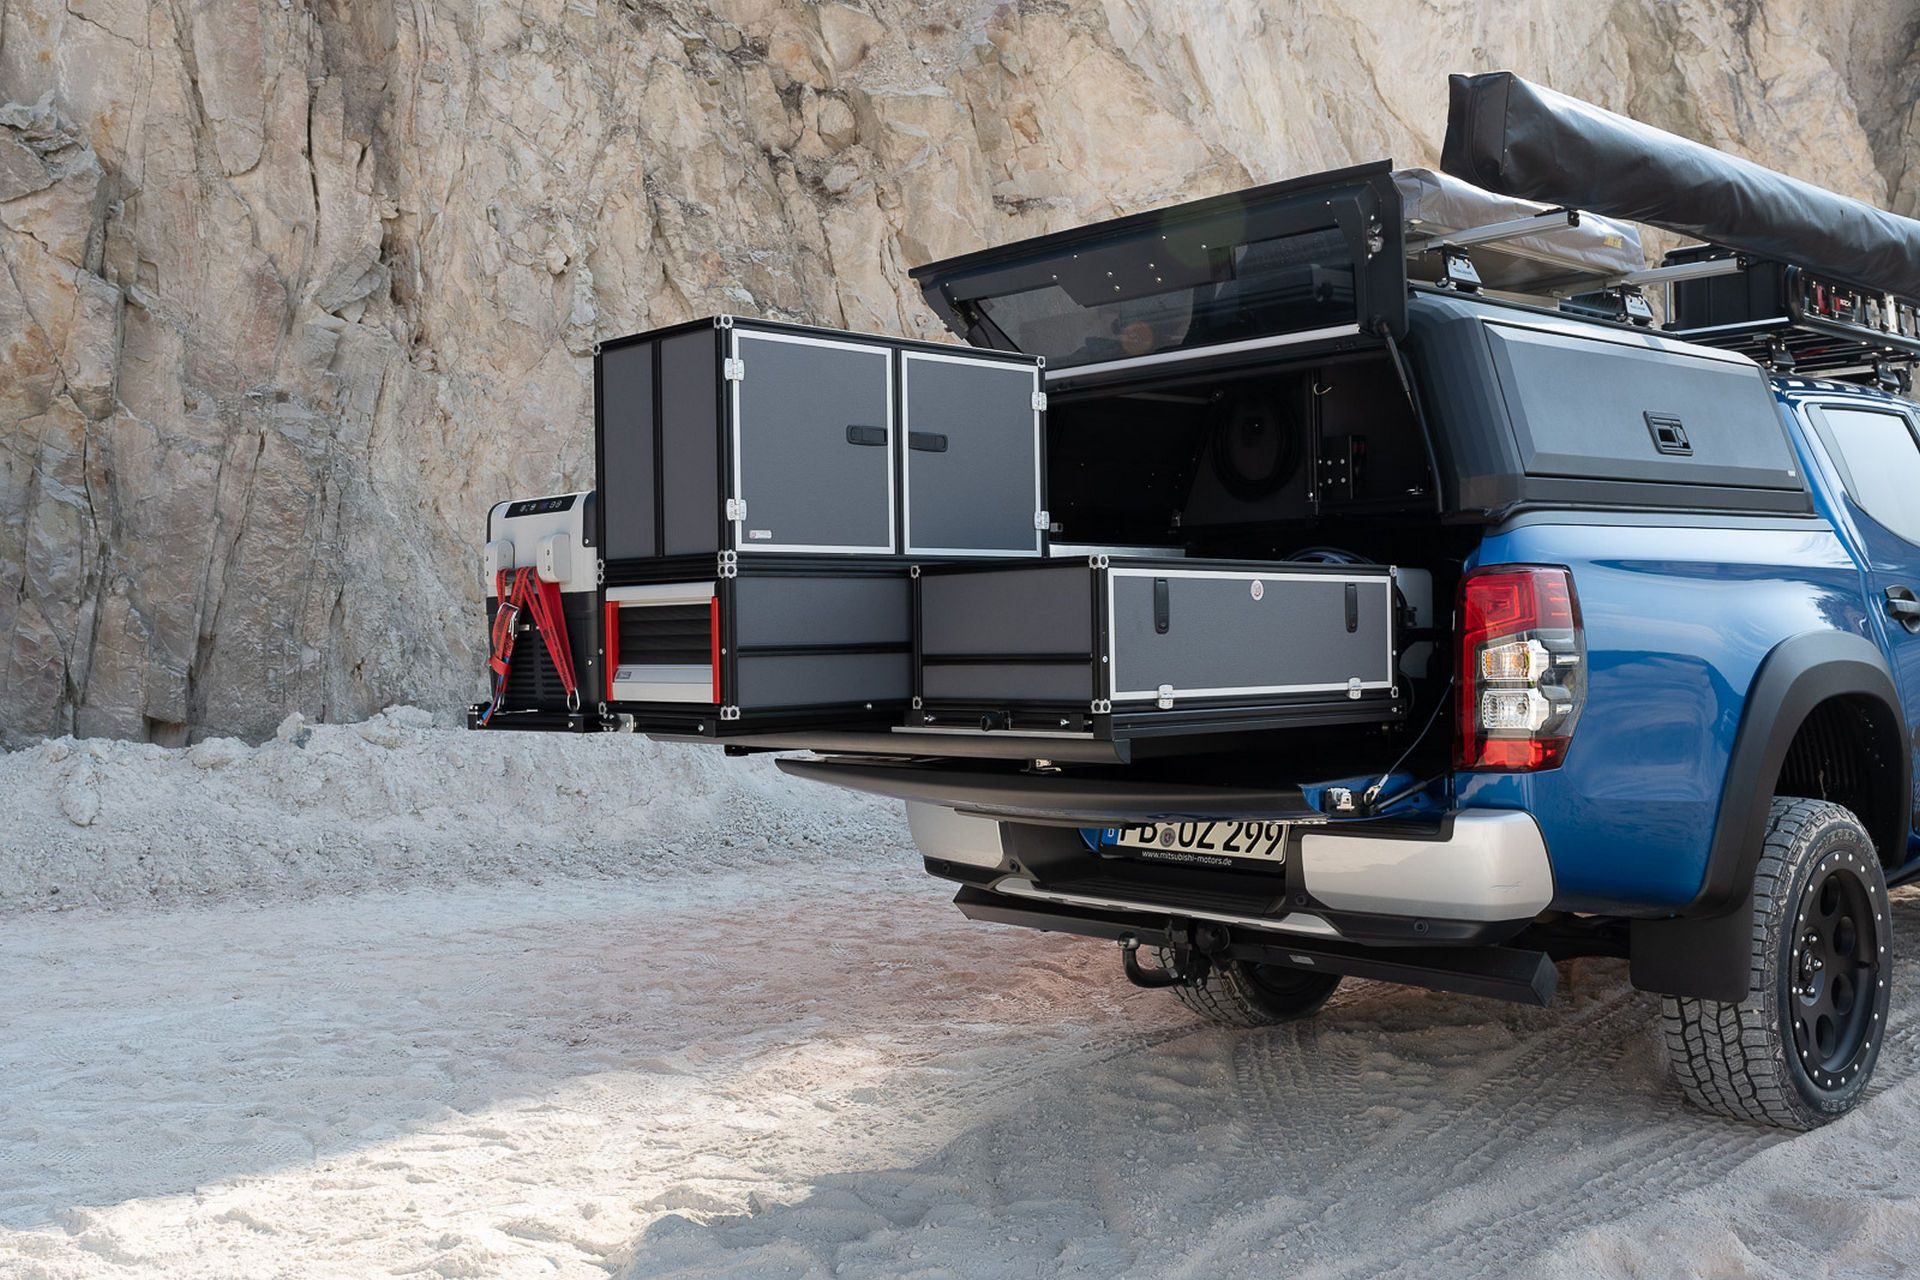 Mitsubishi-L200-Camping-Accessories-3